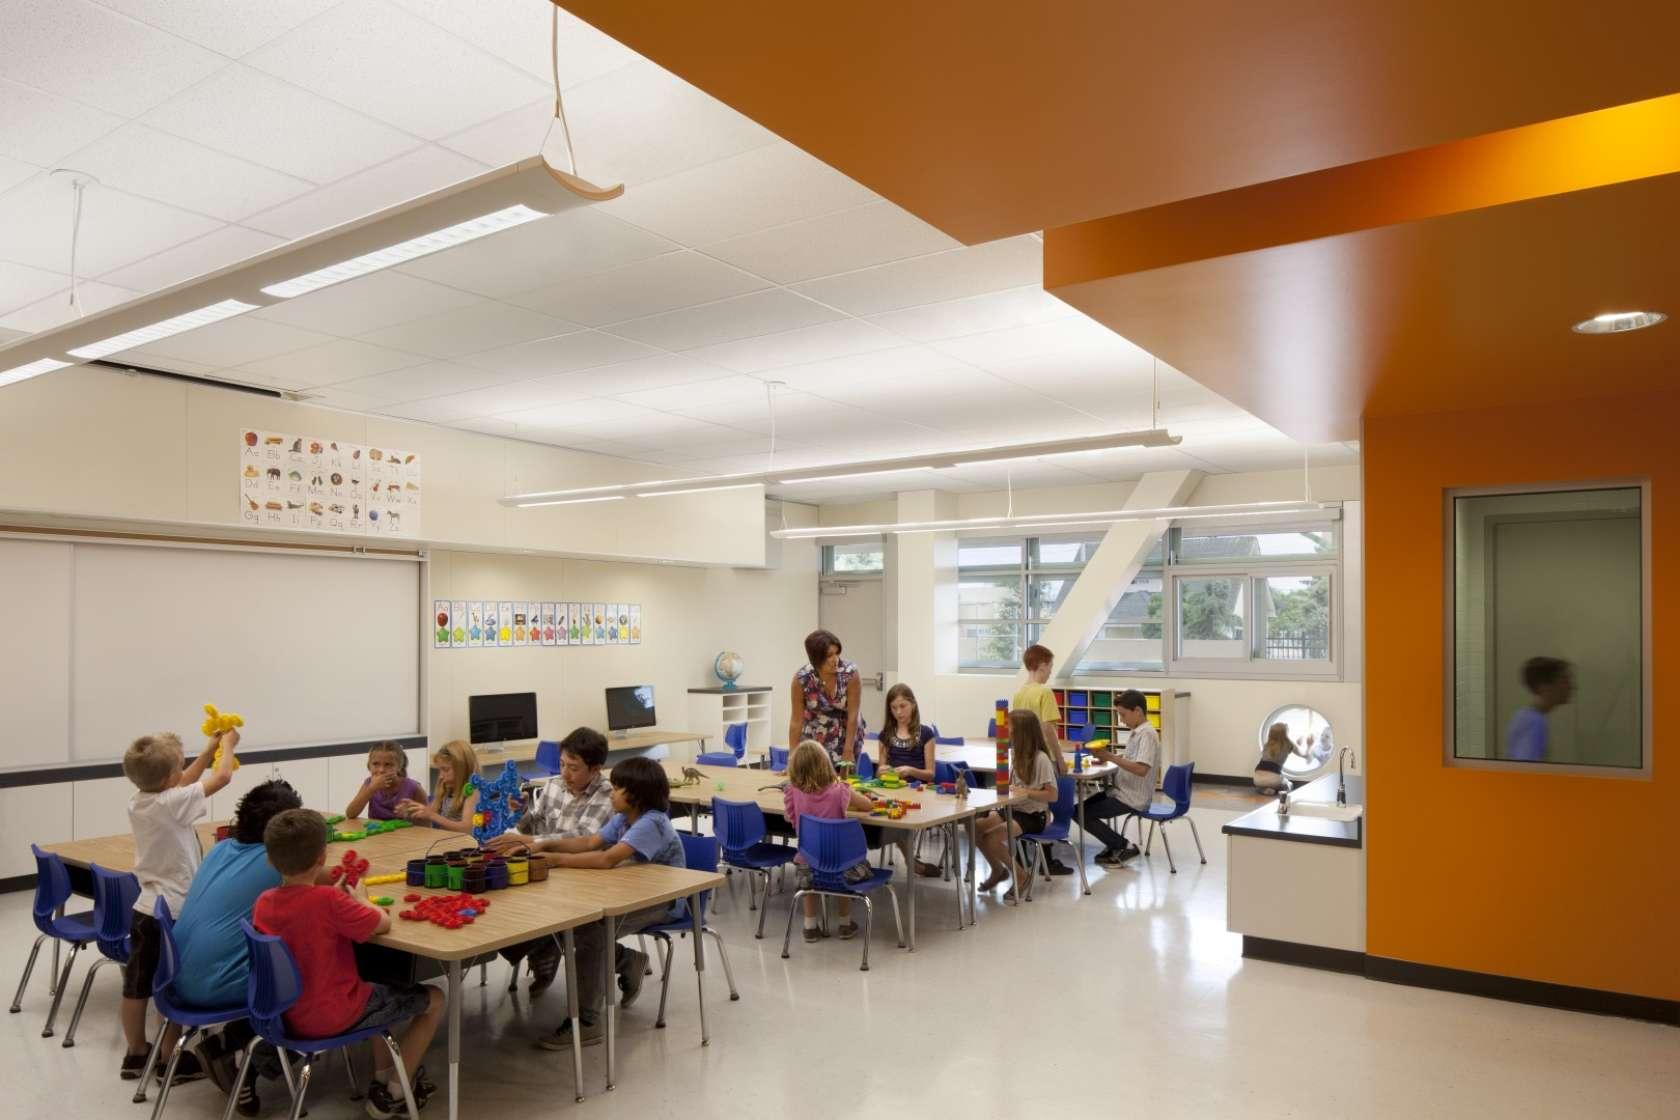 Classroom Design Project ~ South region elementary school architizer